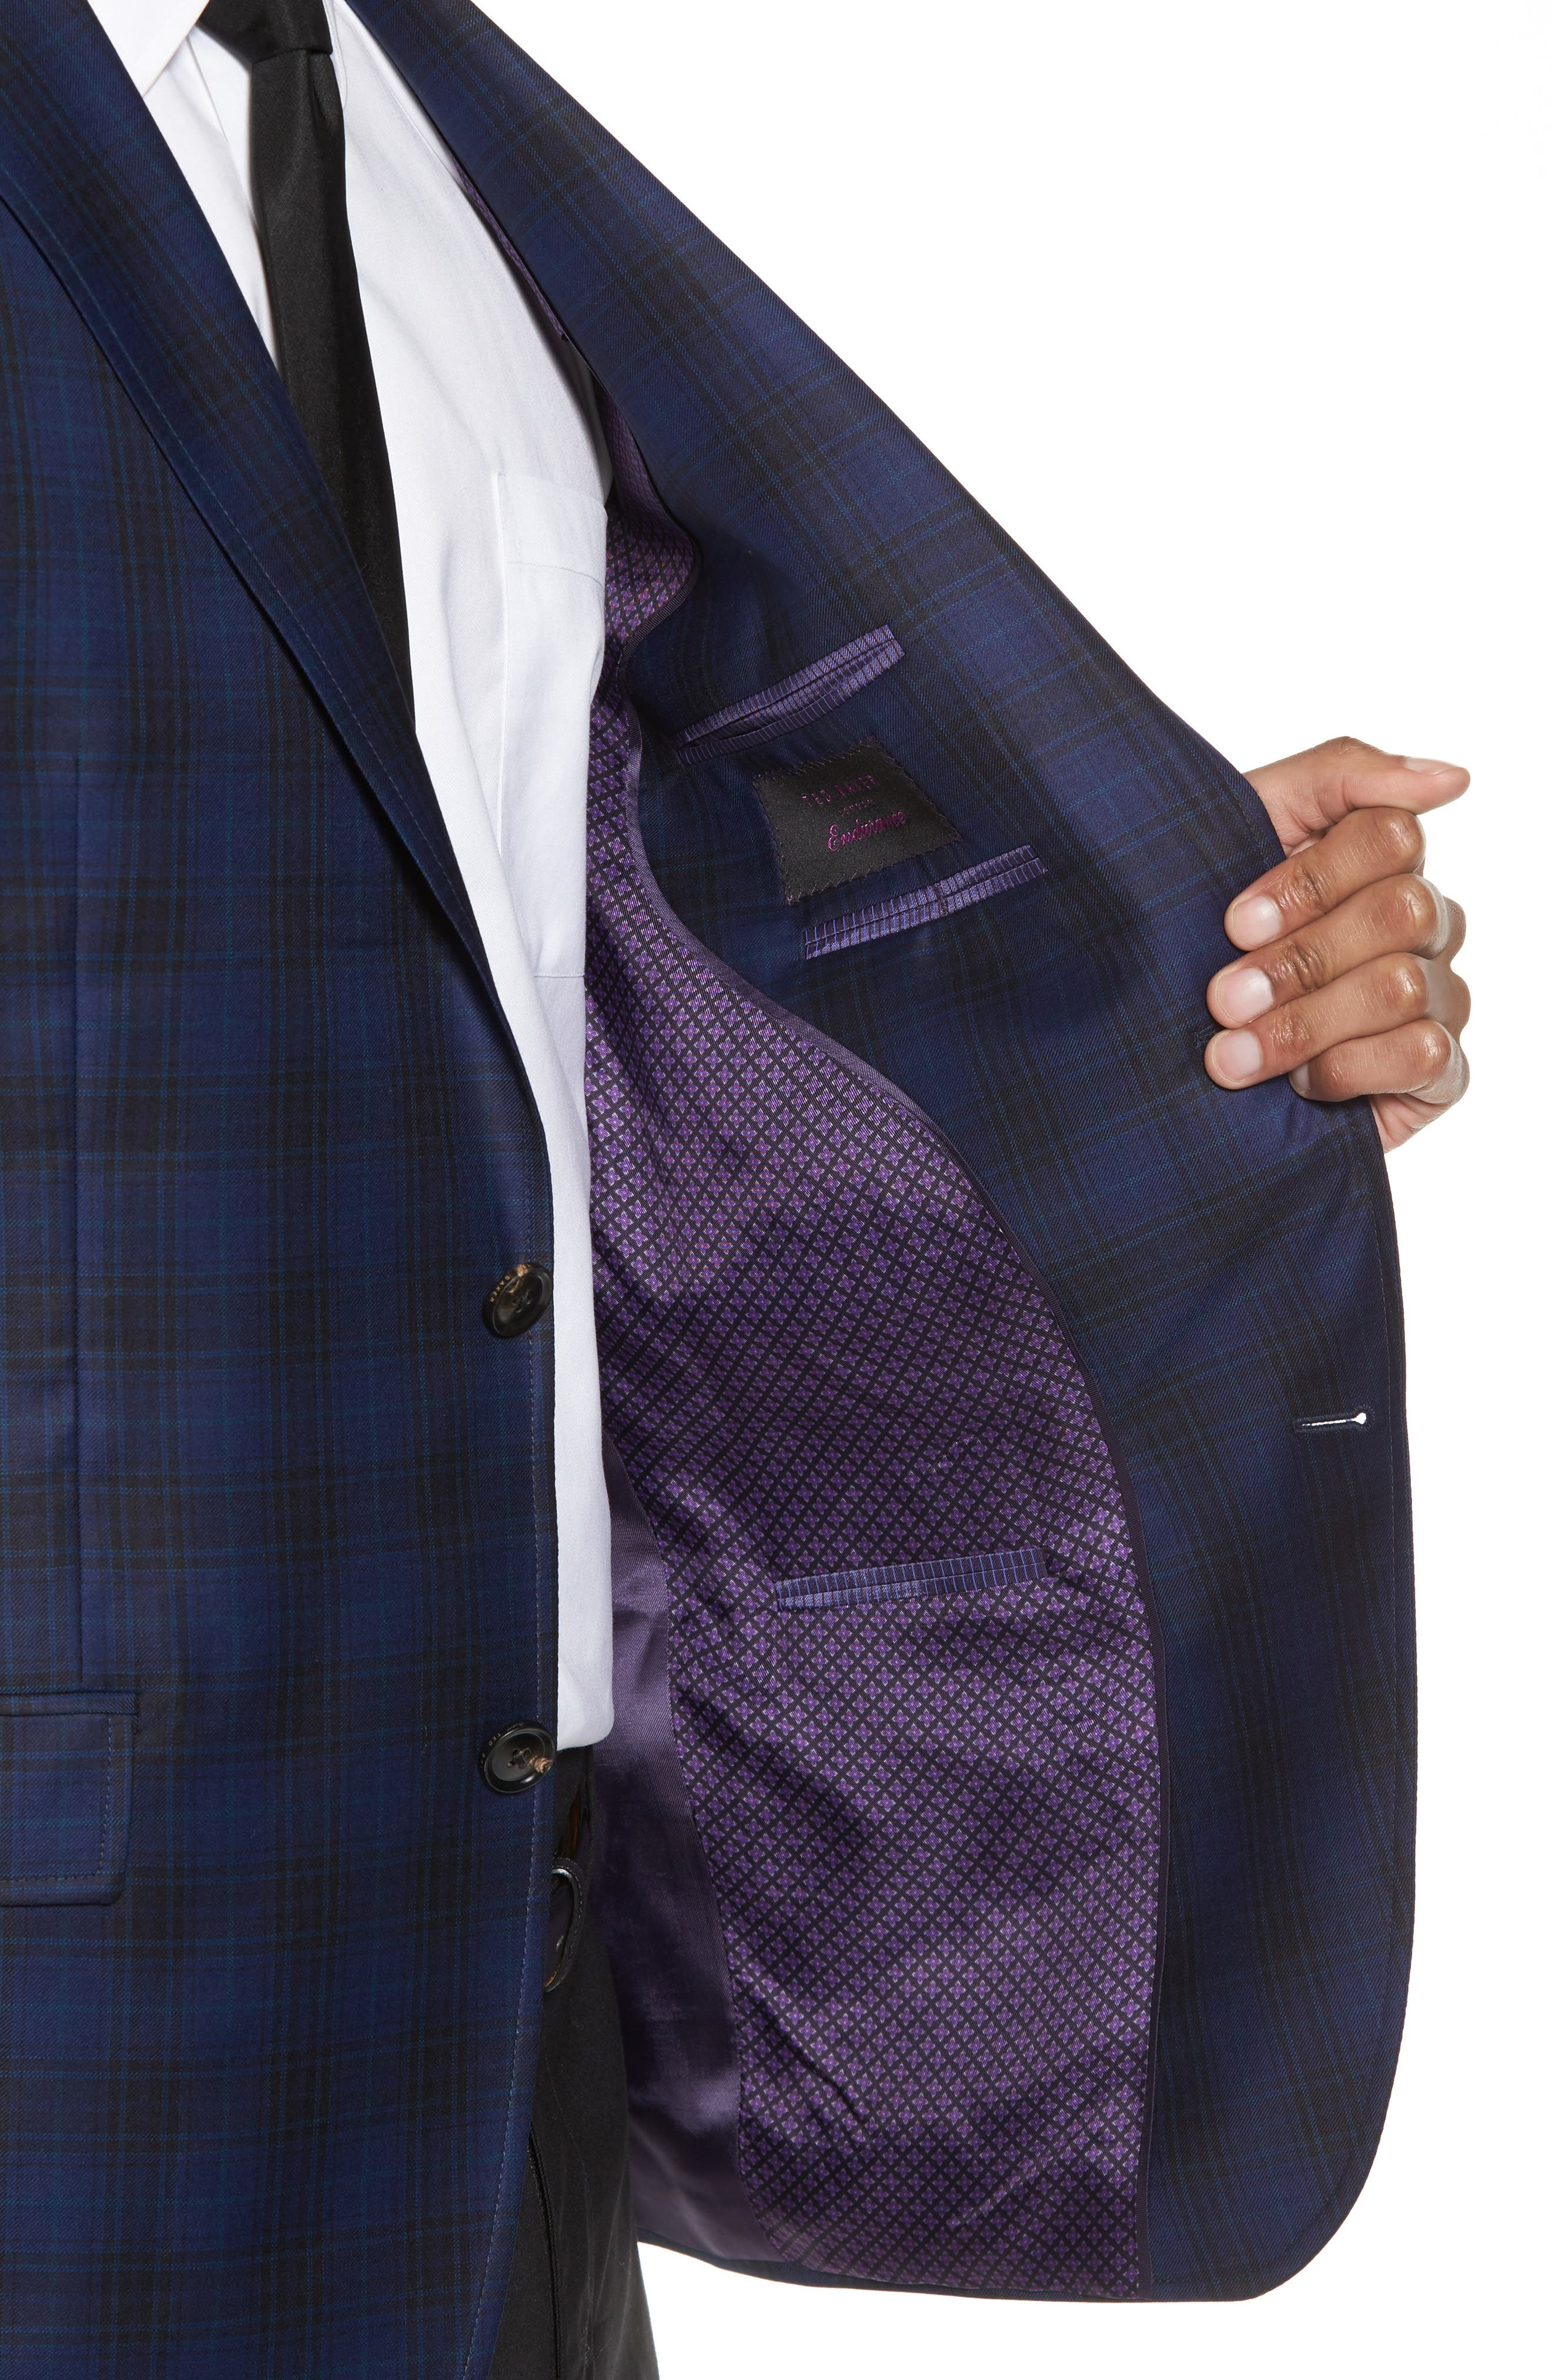 Jay Trim Fit Plaid Wool Sport Coat,                             Alternate thumbnail 4, color,                             Navy